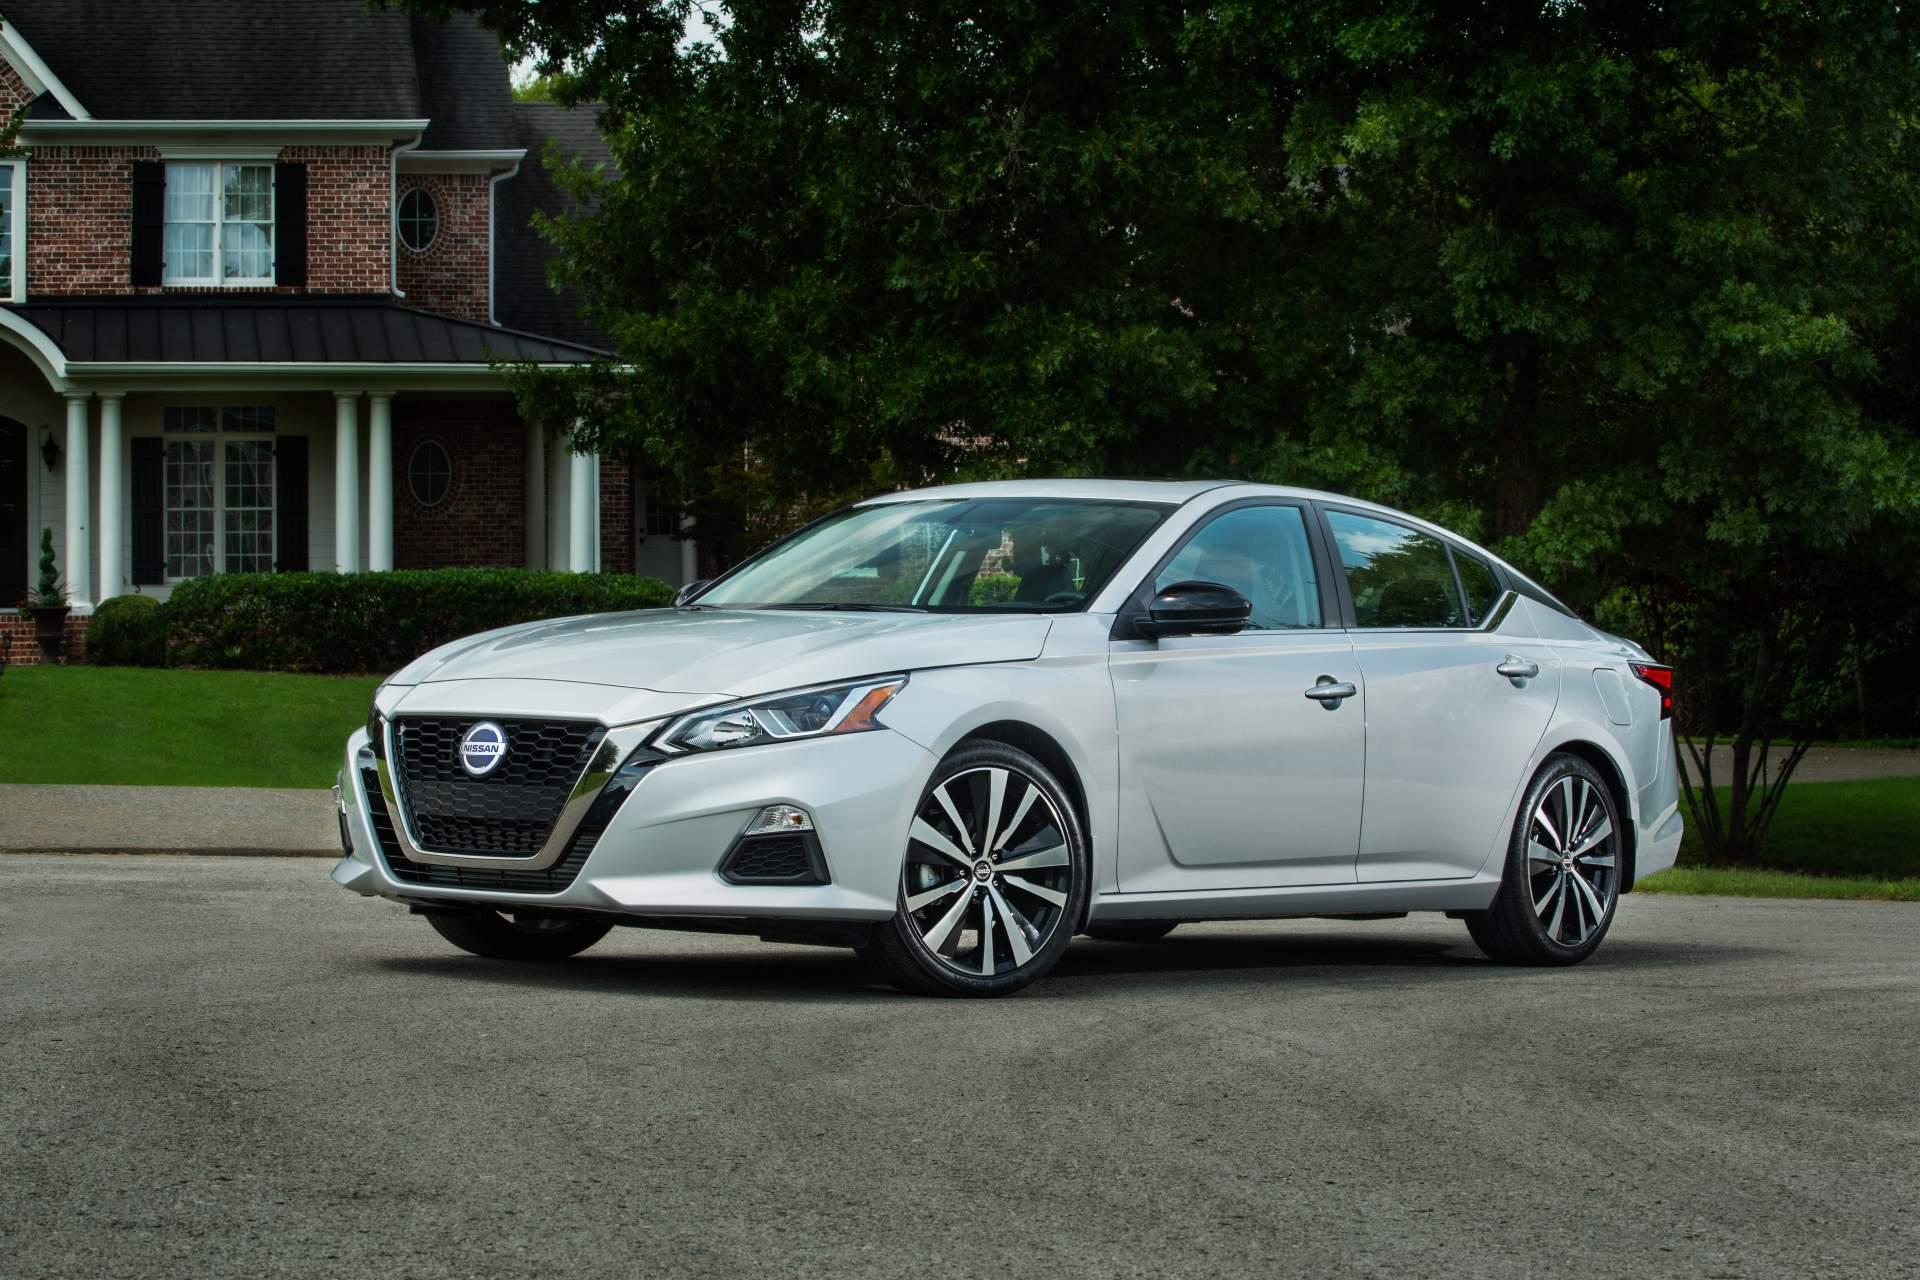 top-10-sedan-ban-chay-2019-nissan-altima-1.jpg